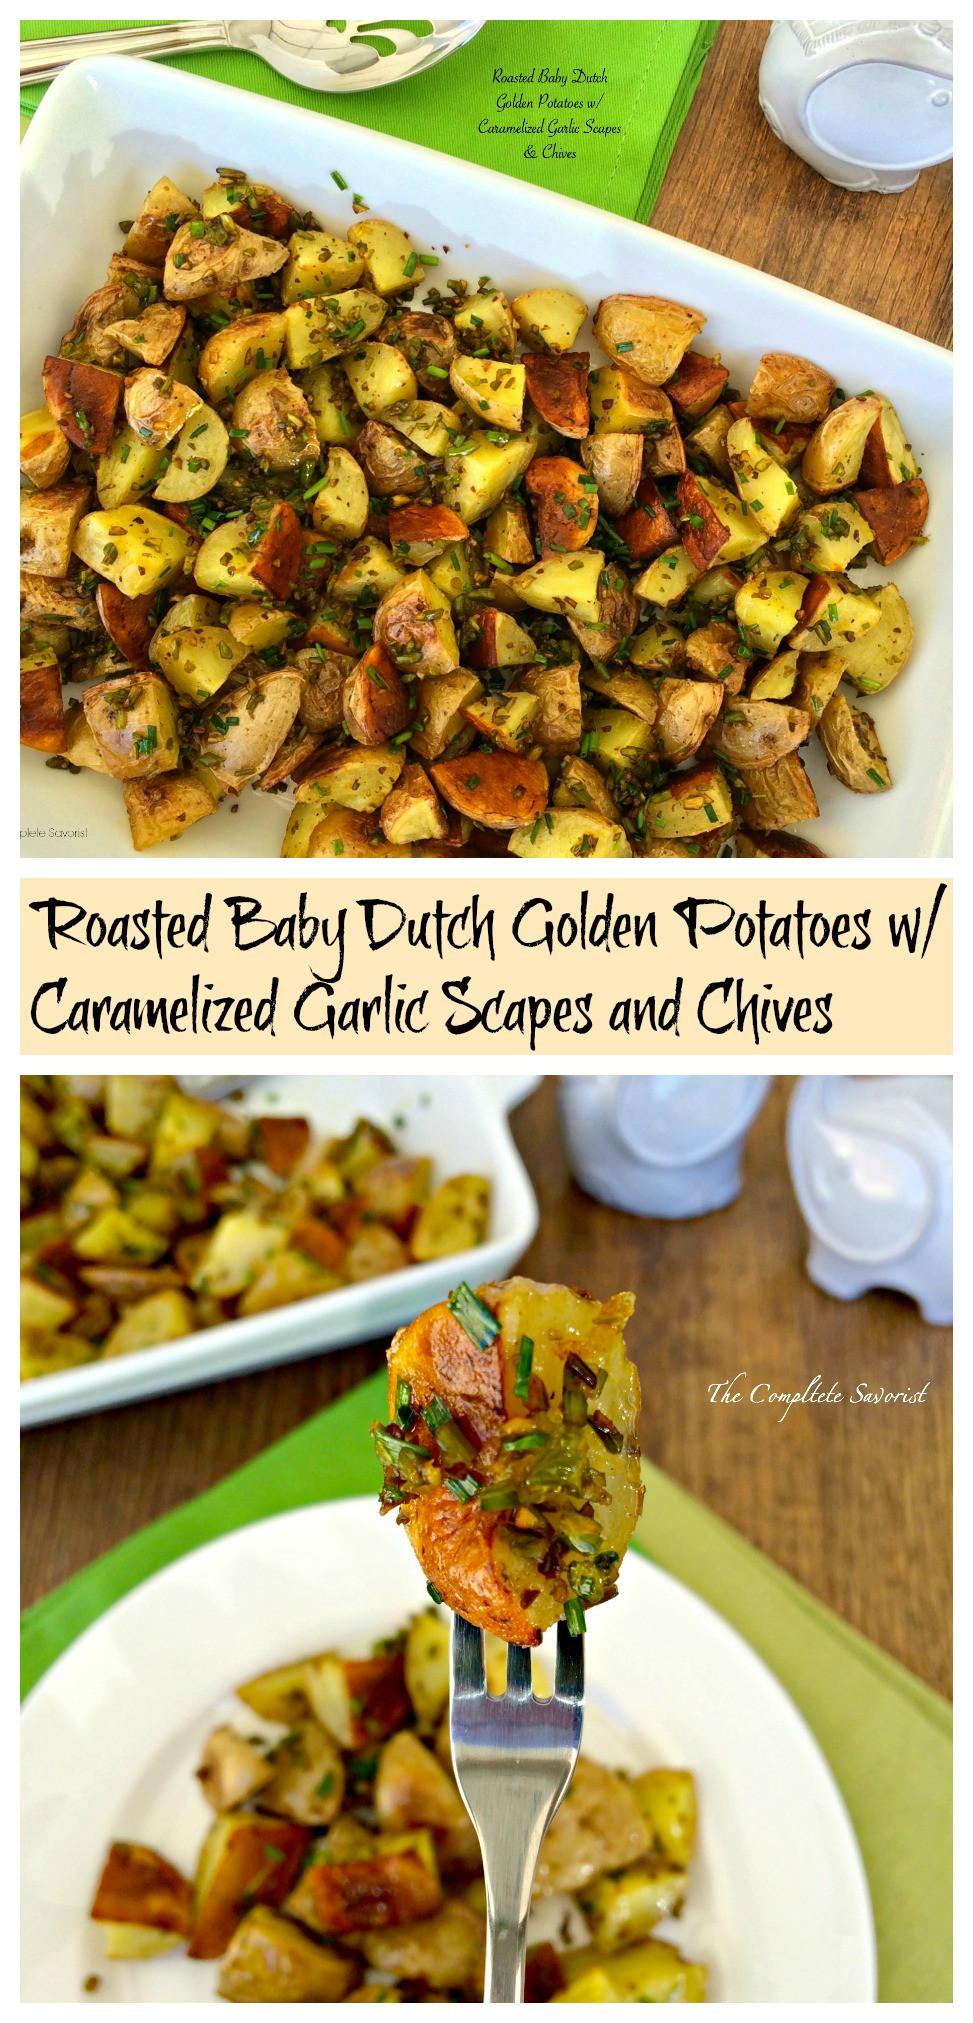 Roasted Baby Dutch Potatoes  Roasted Baby Dutch Golden Potatoes w Caramelized Garlic